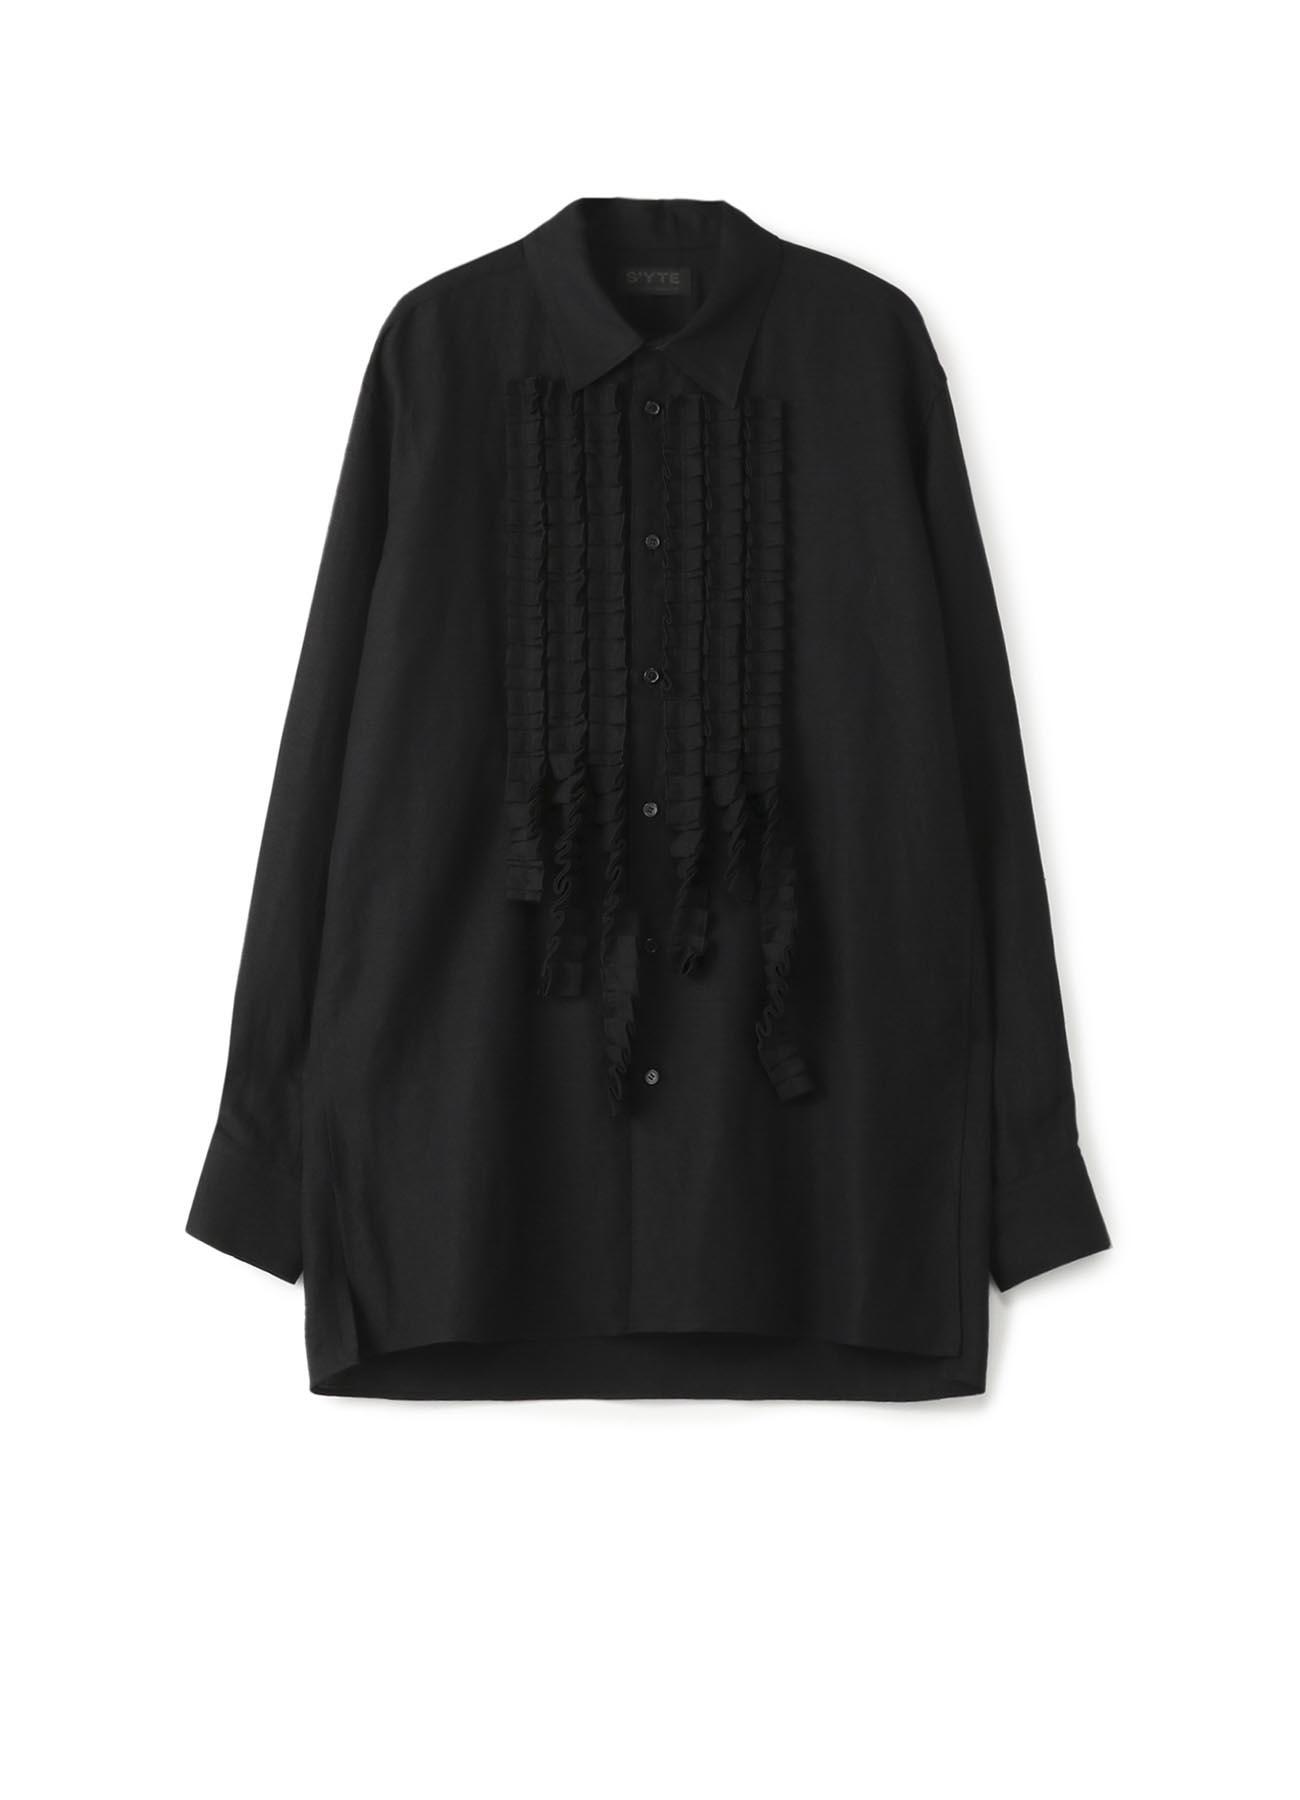 Rayon/Linen Bio Washer Fringe Frill Shirt